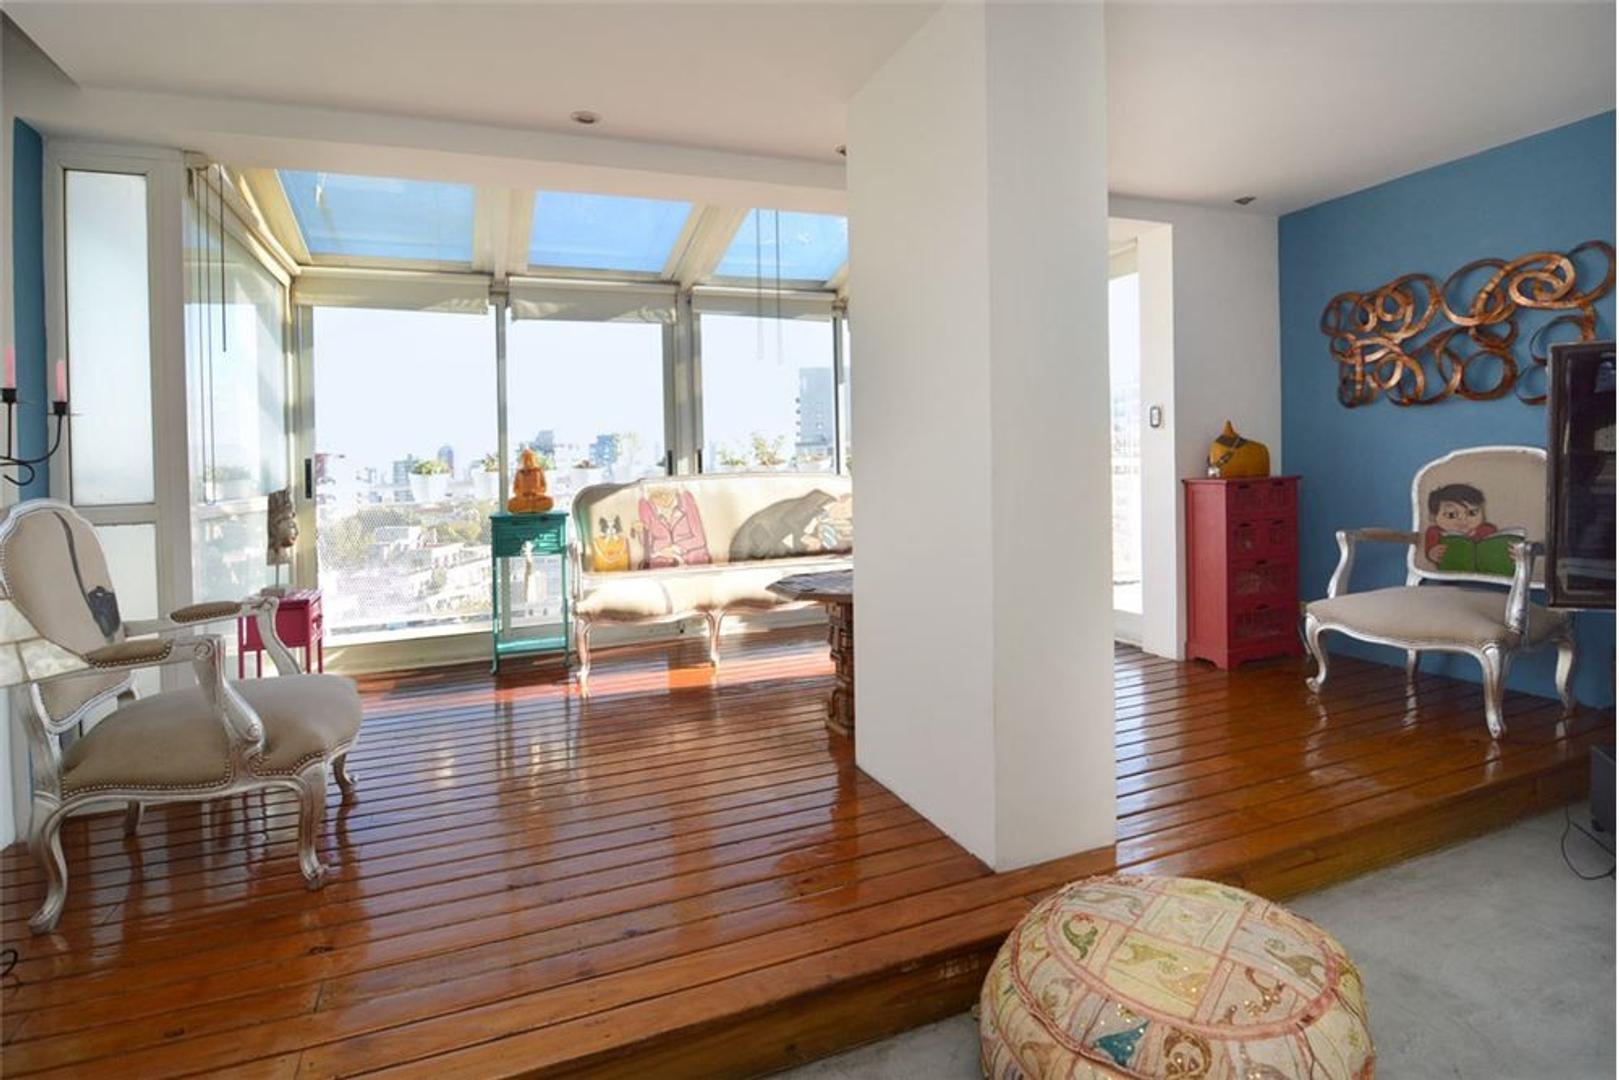 Espectacular departamento tipo Loft de 140 m2